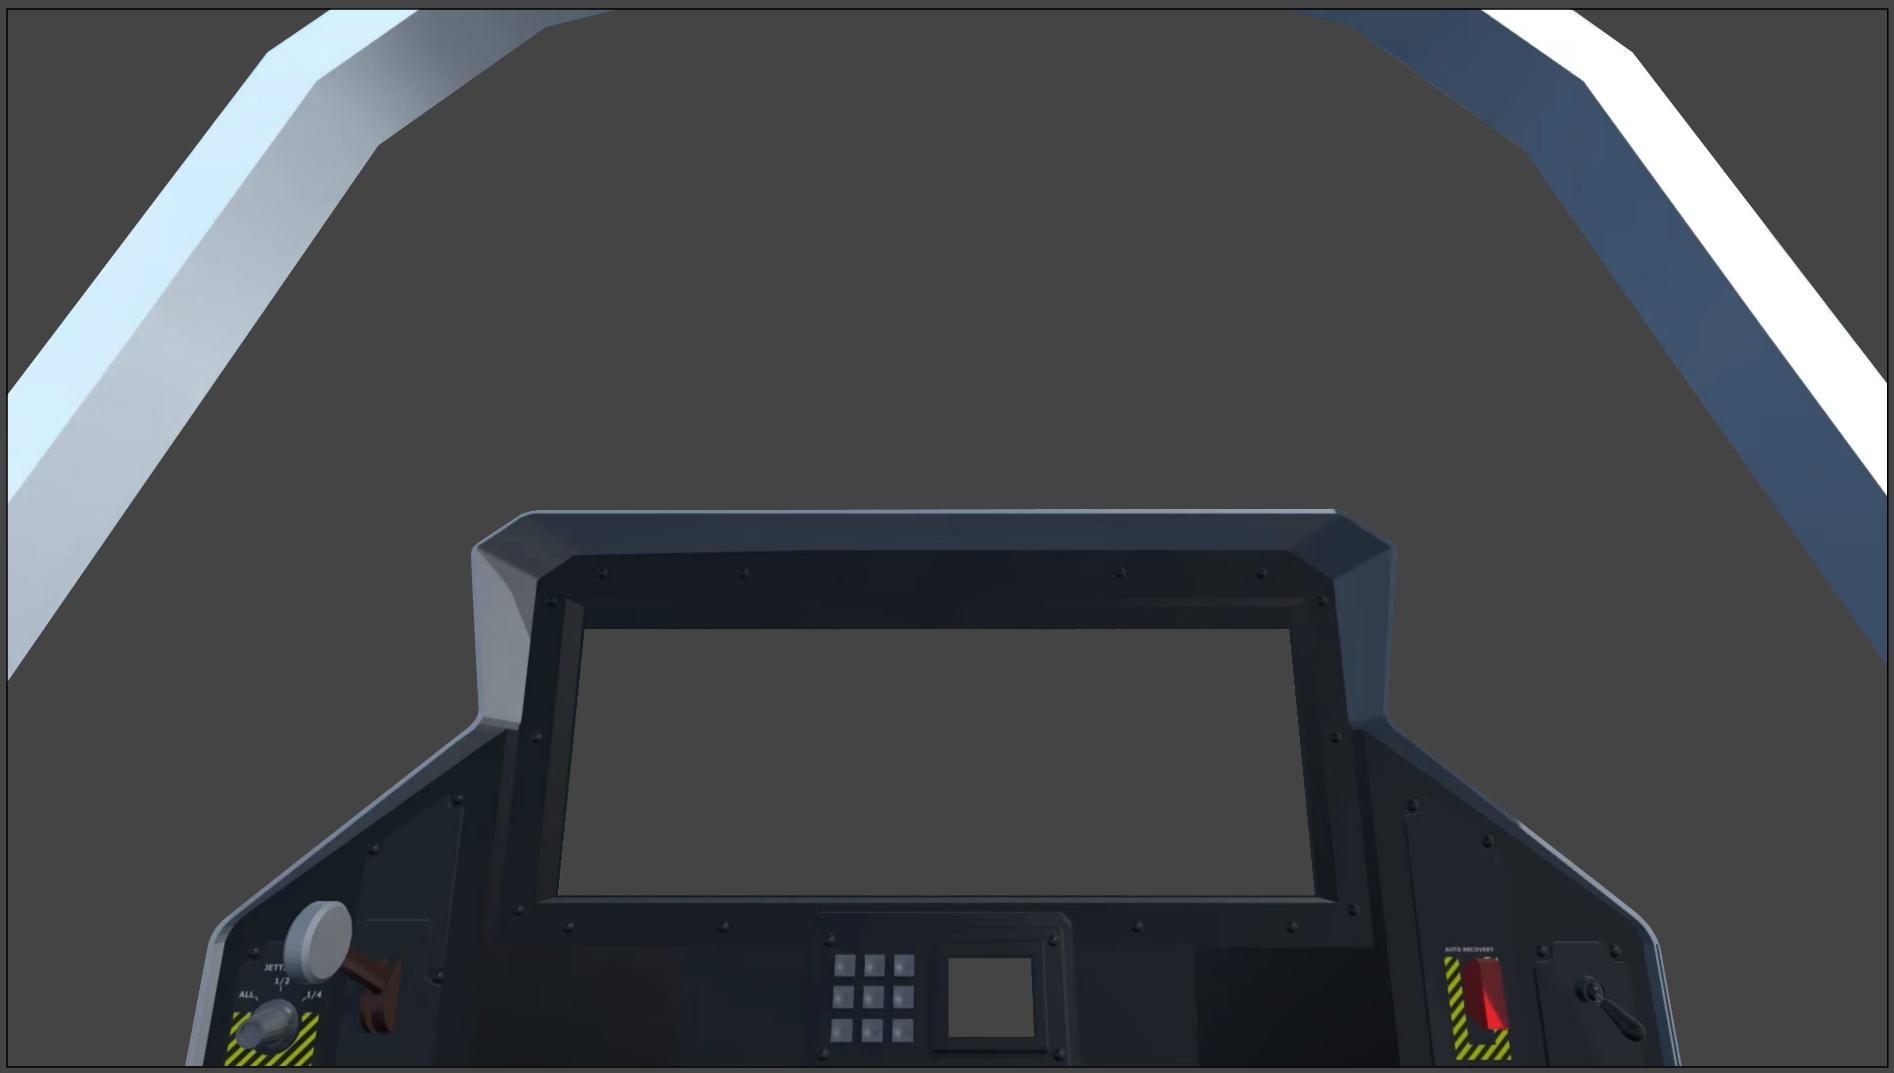 flight simulator UI